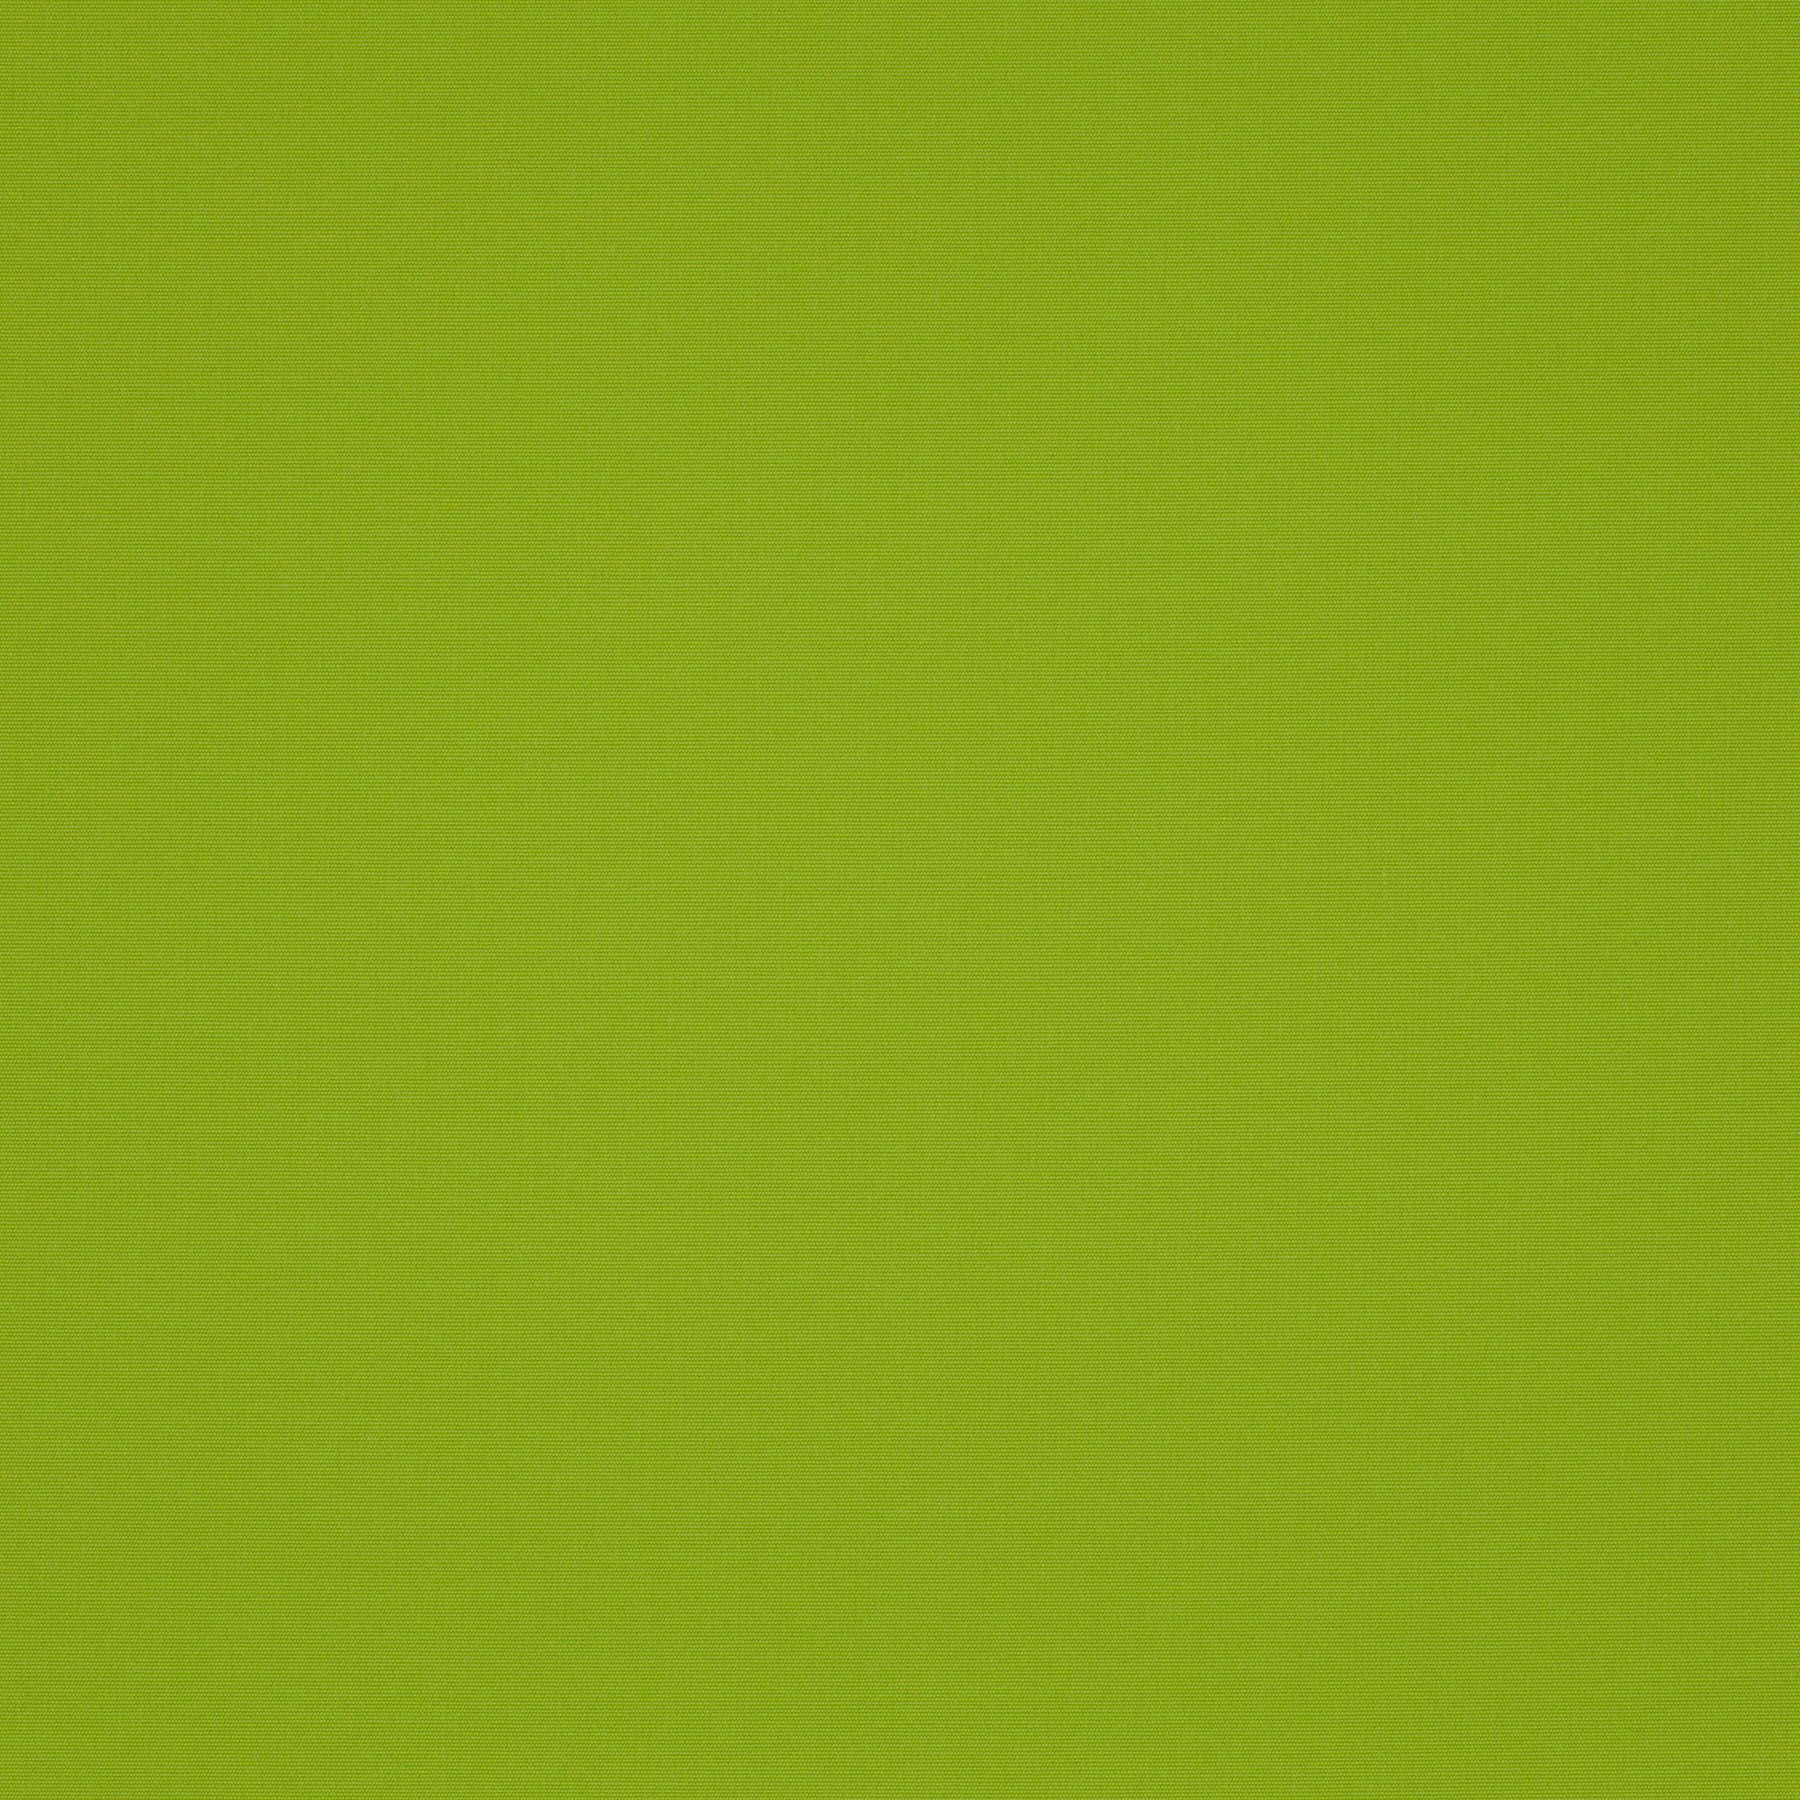 upholstery fabric out side 1 1273 030 jab anstoetz. Black Bedroom Furniture Sets. Home Design Ideas